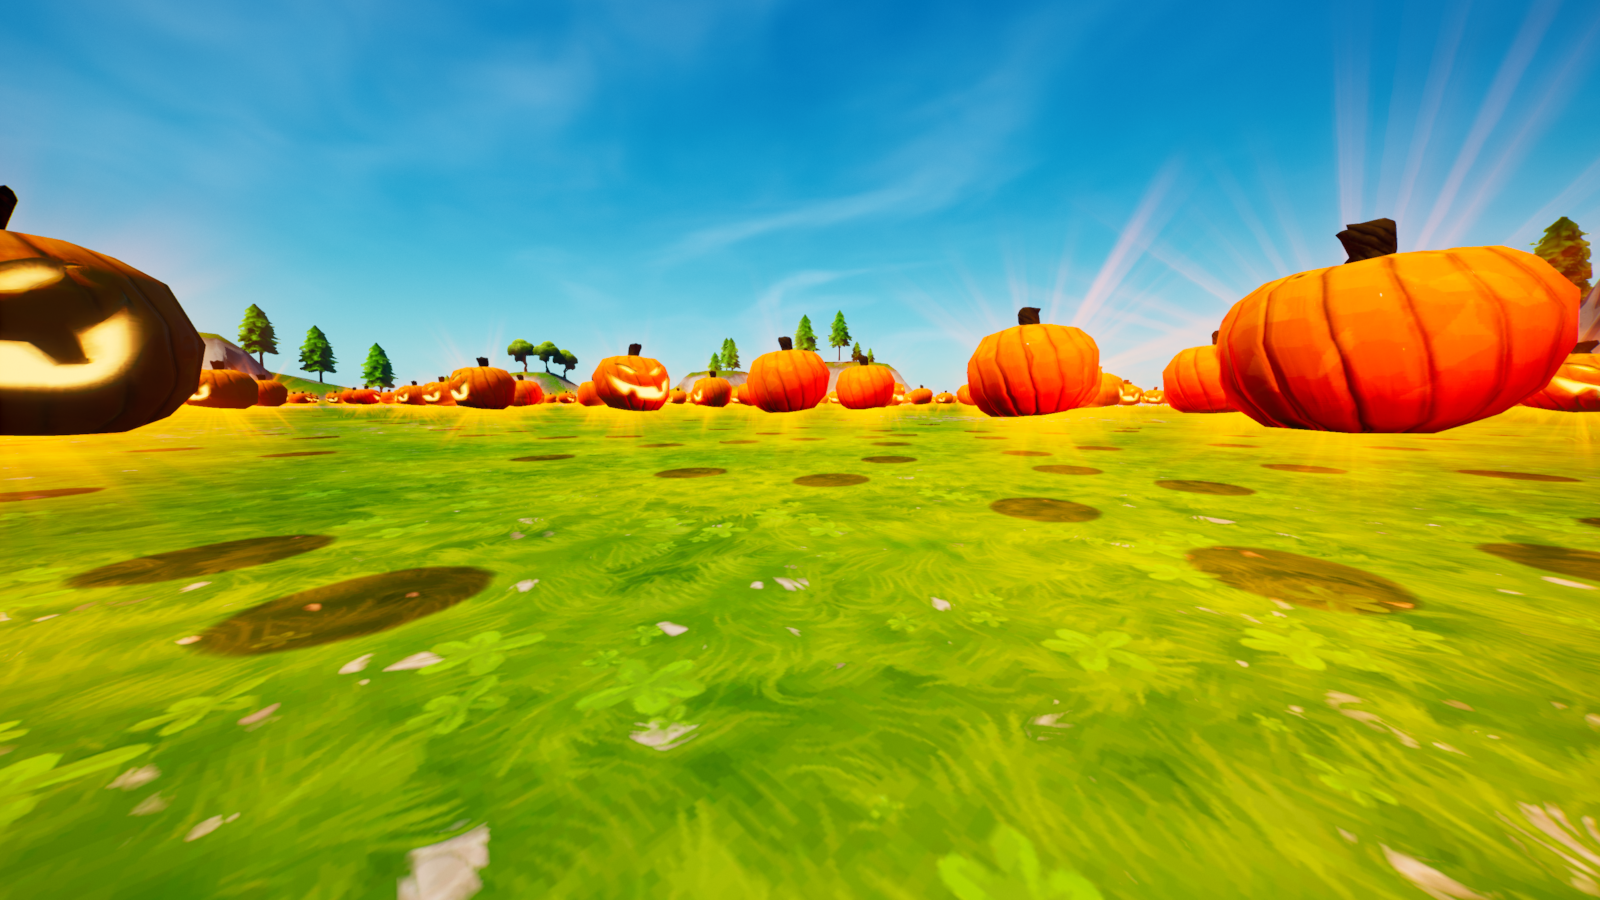 Easy Pumpkin quest 2379-1880-4612 by corey-is-crazy